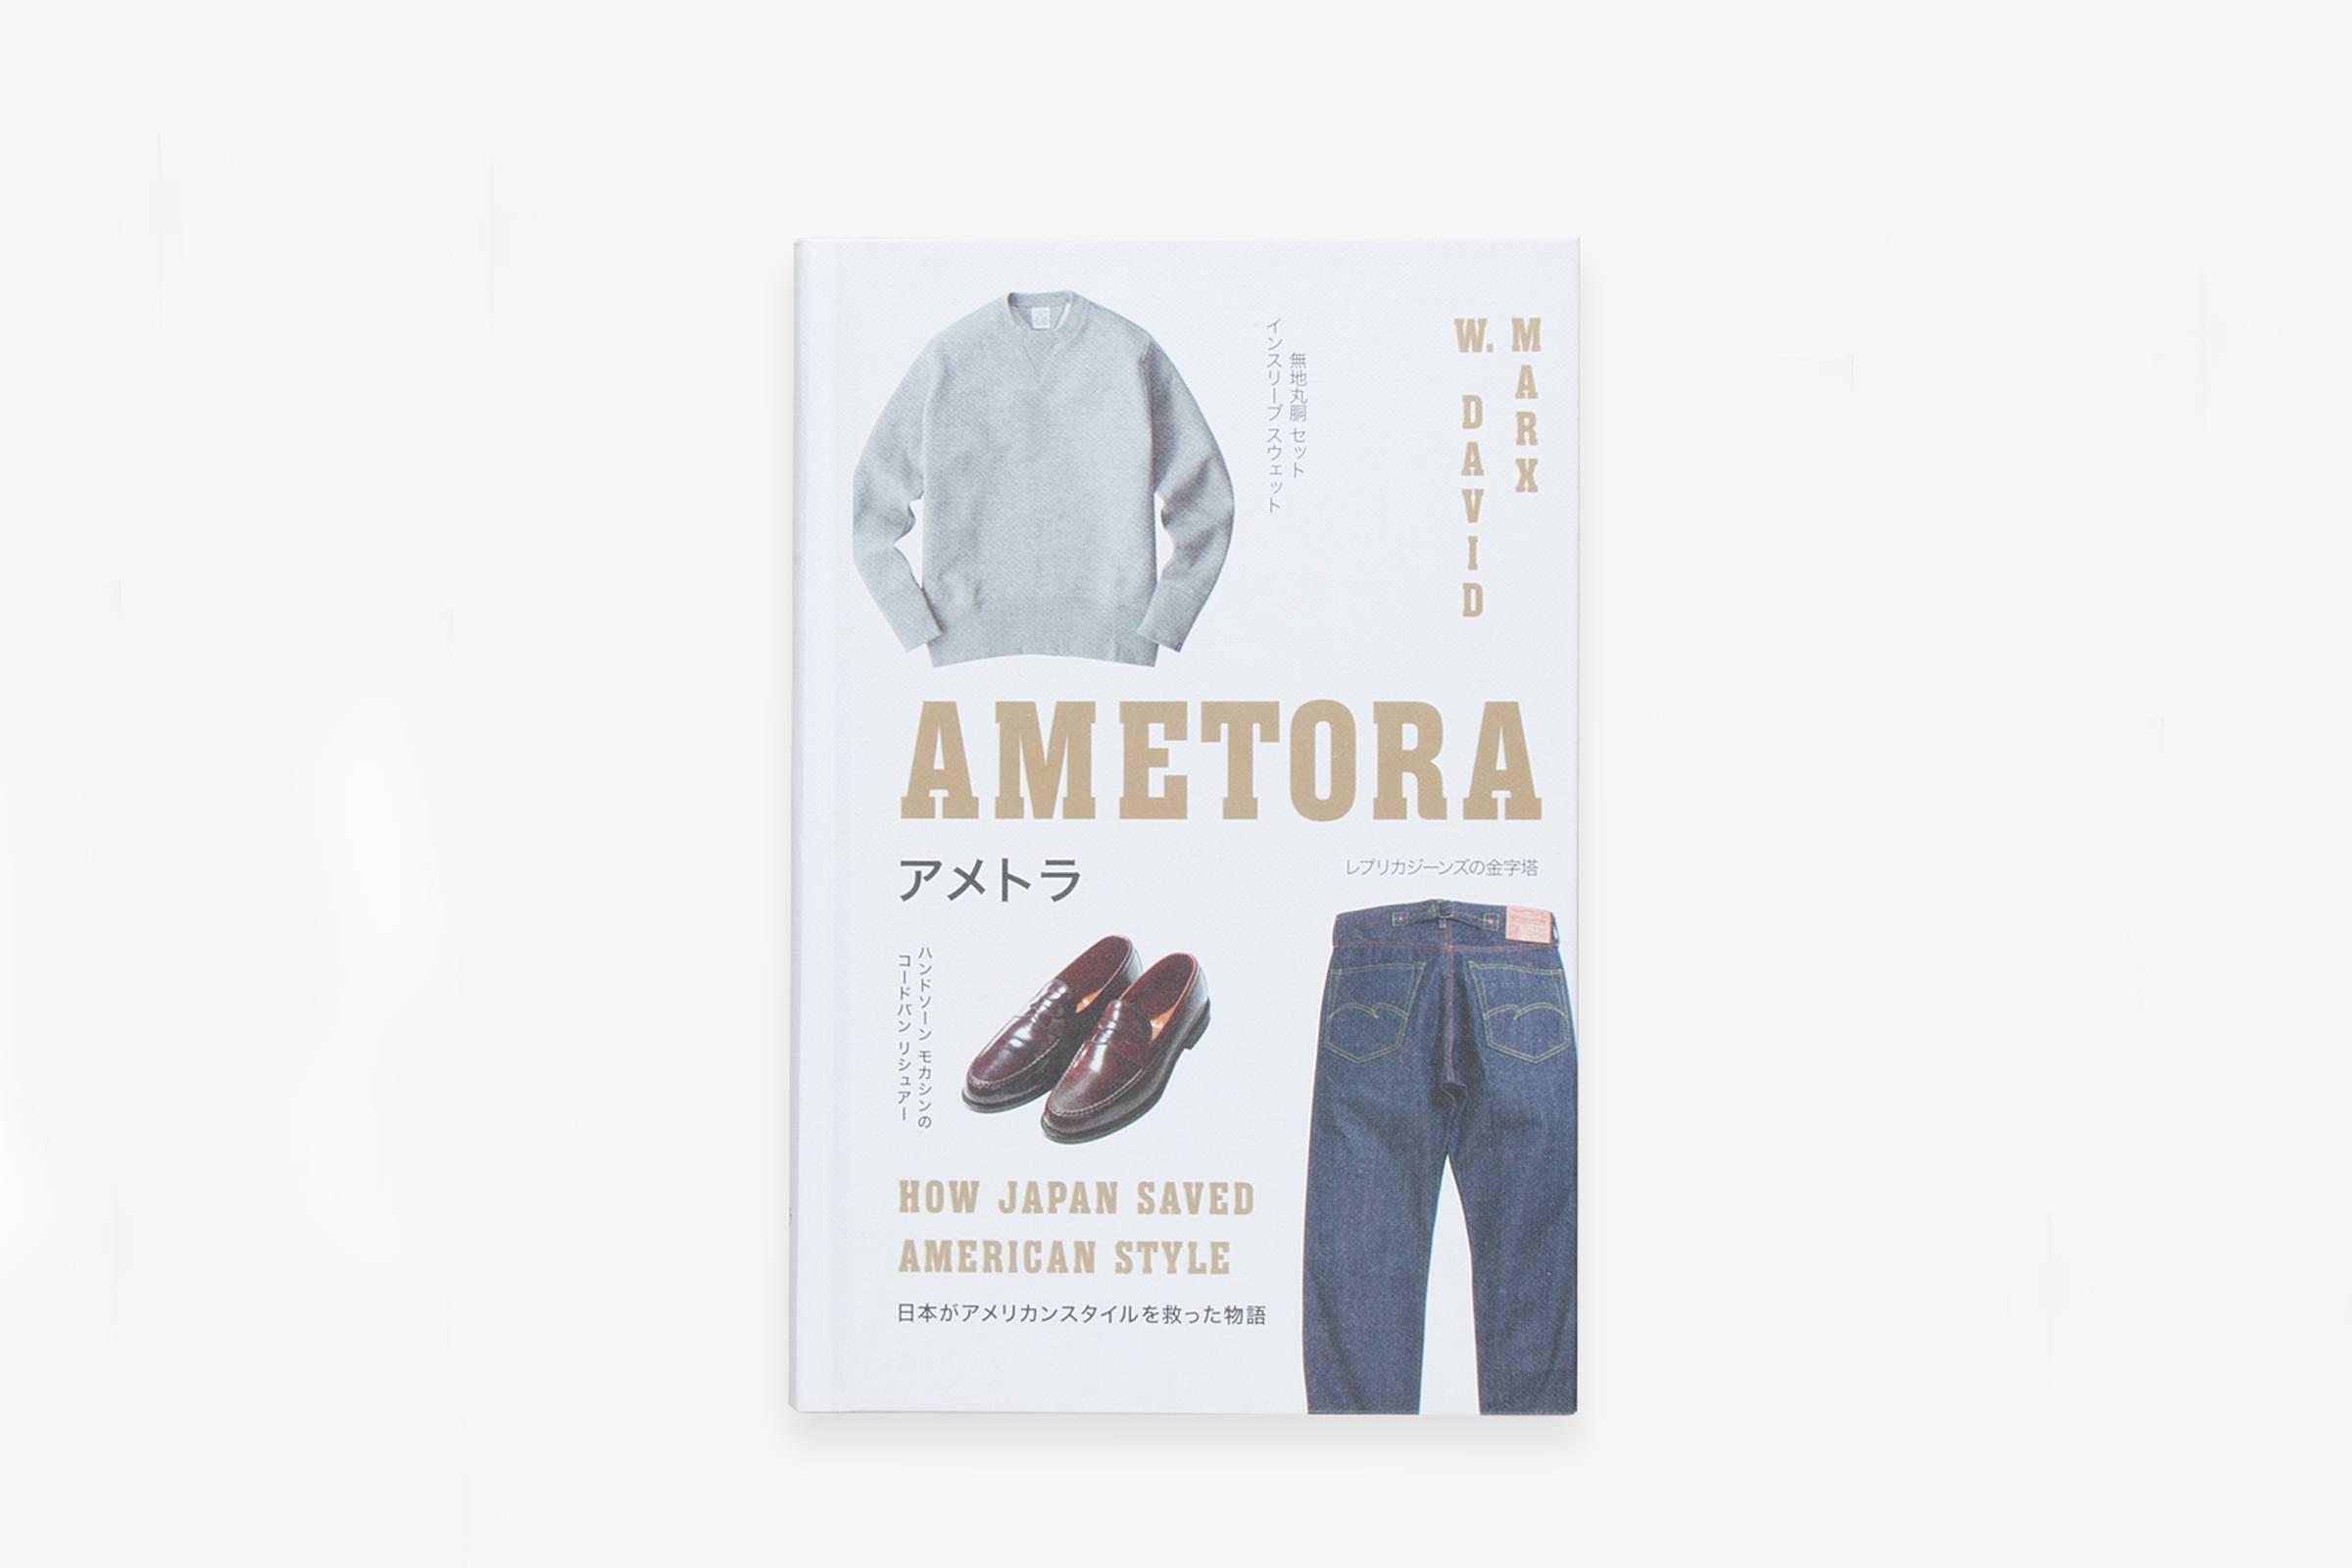 Ametora: How Japan Saved American Style (Basic Books 2015)